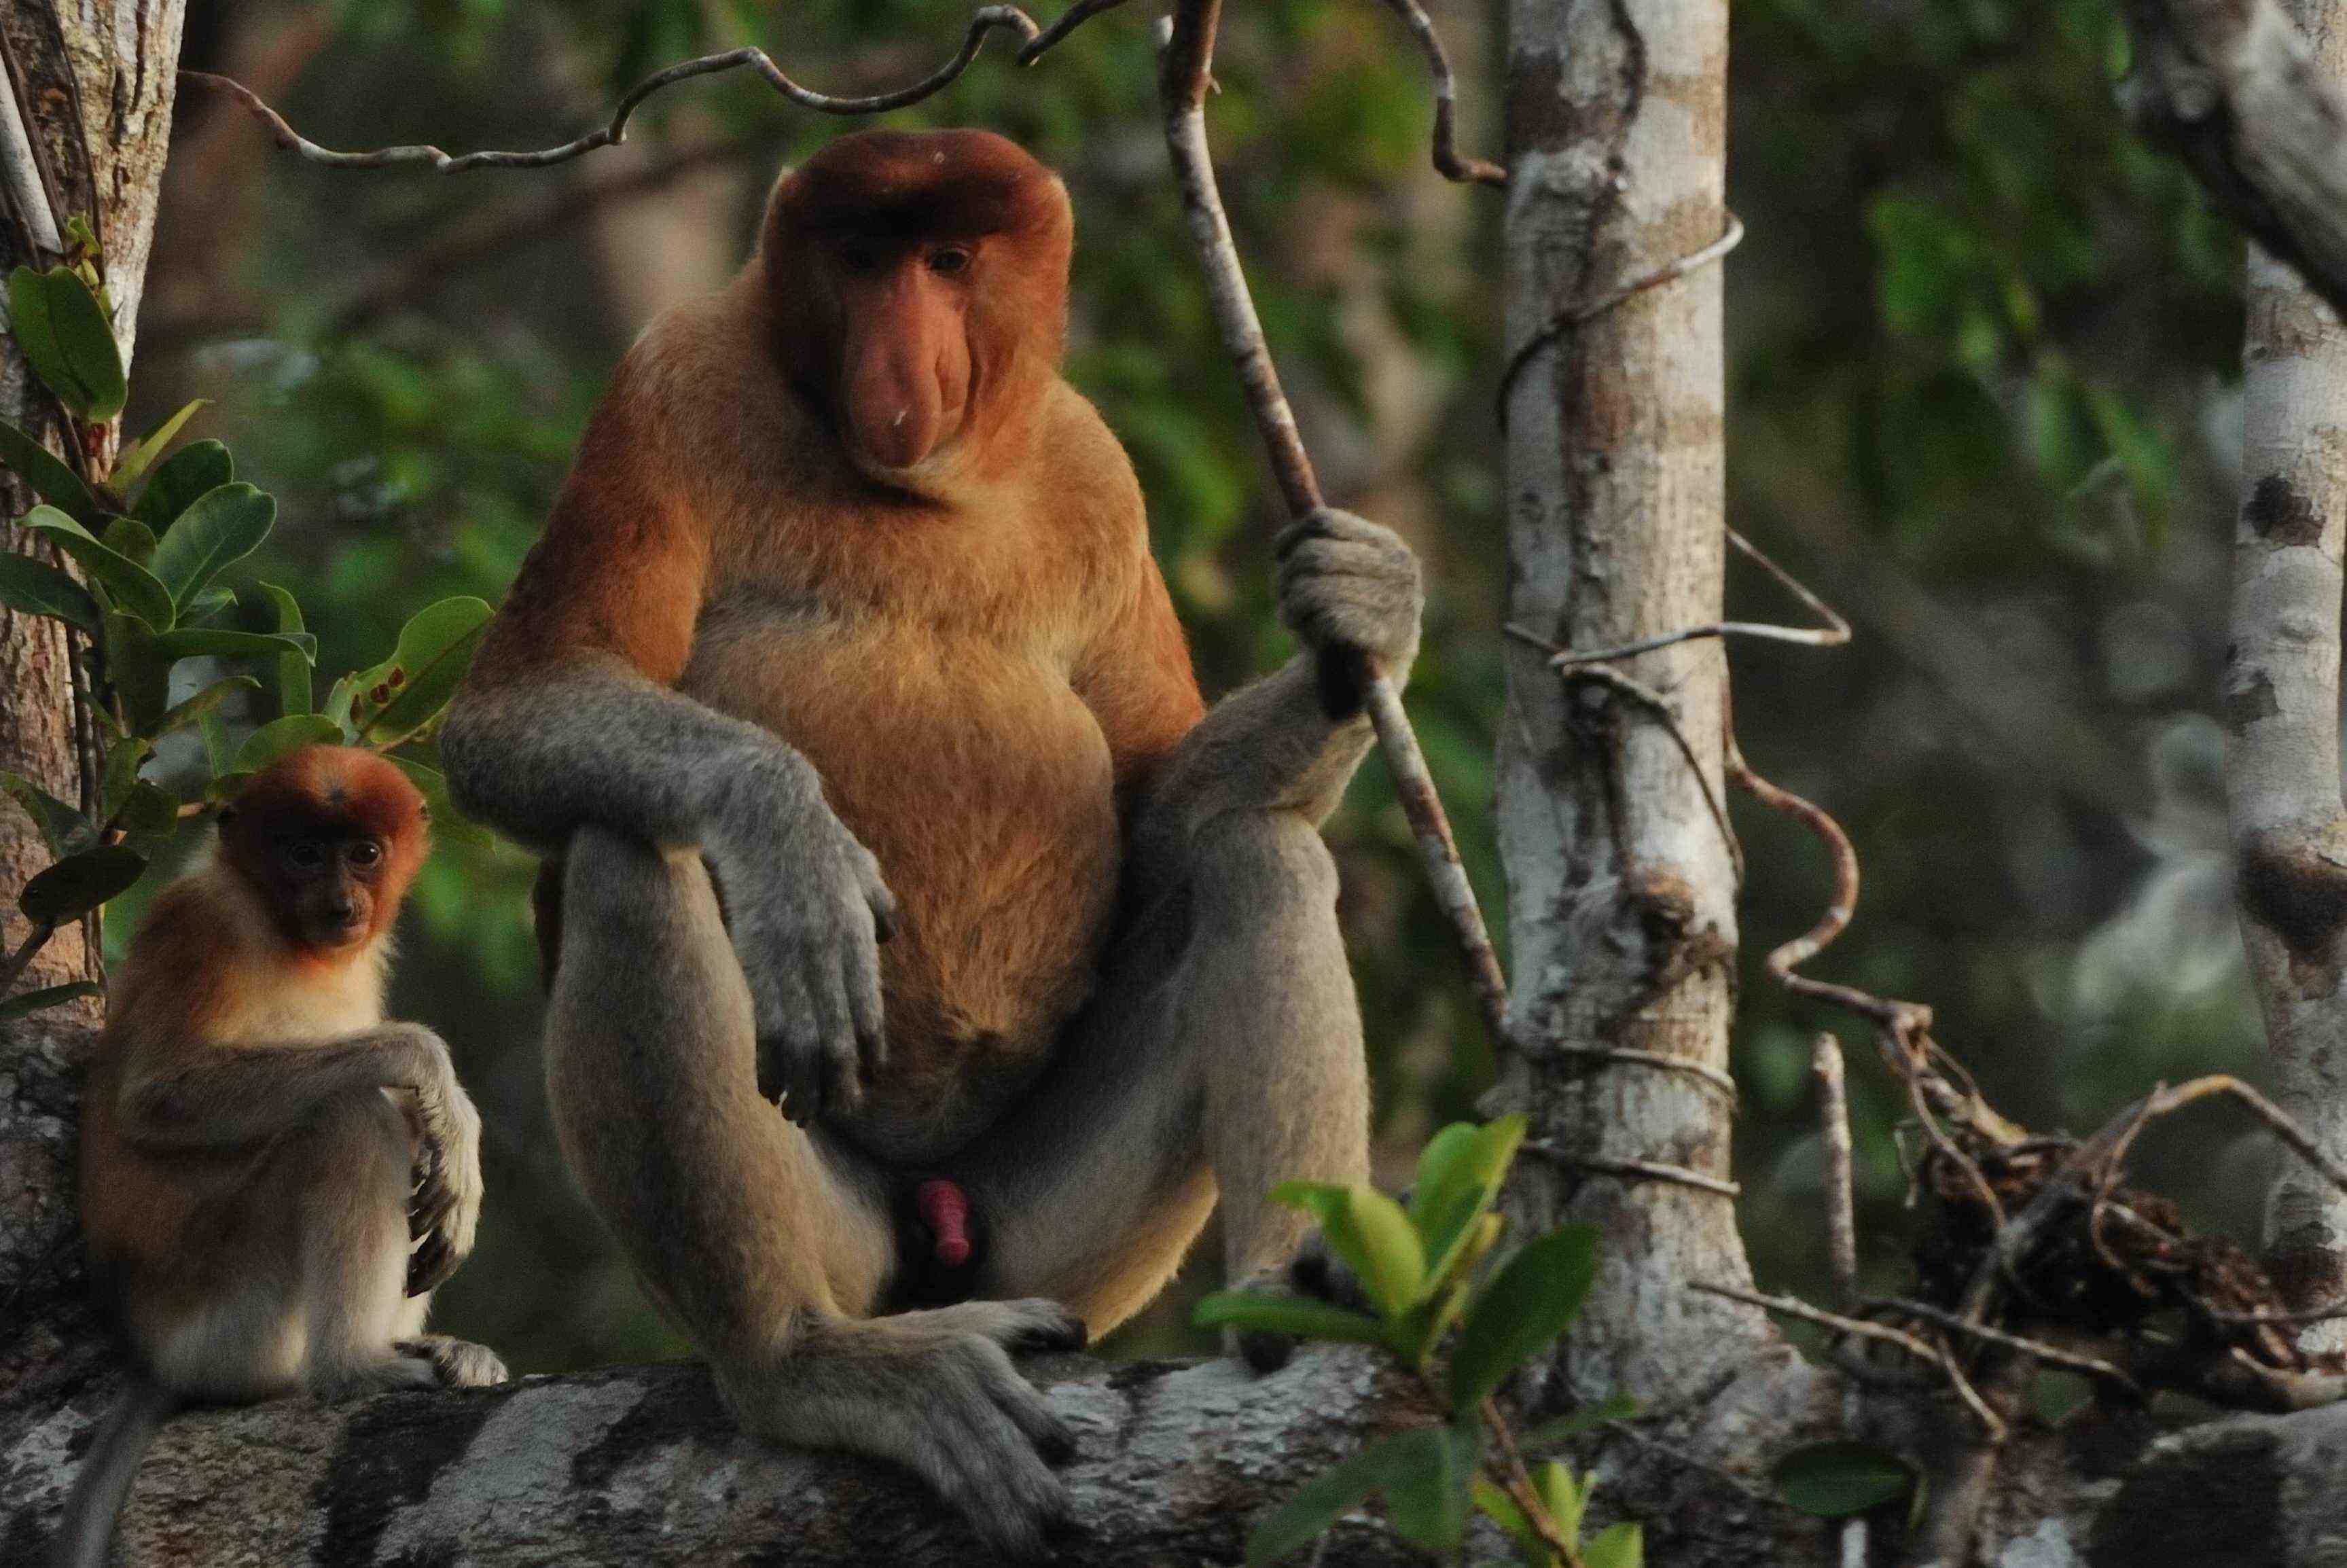 tanjung puting orangutan wildlife proboscis monkey, banjarmasin floating market, loksado bamboo rafting, meratus mount rain forest, mahakam river cuise dayak culture art longhouse tour trip guide